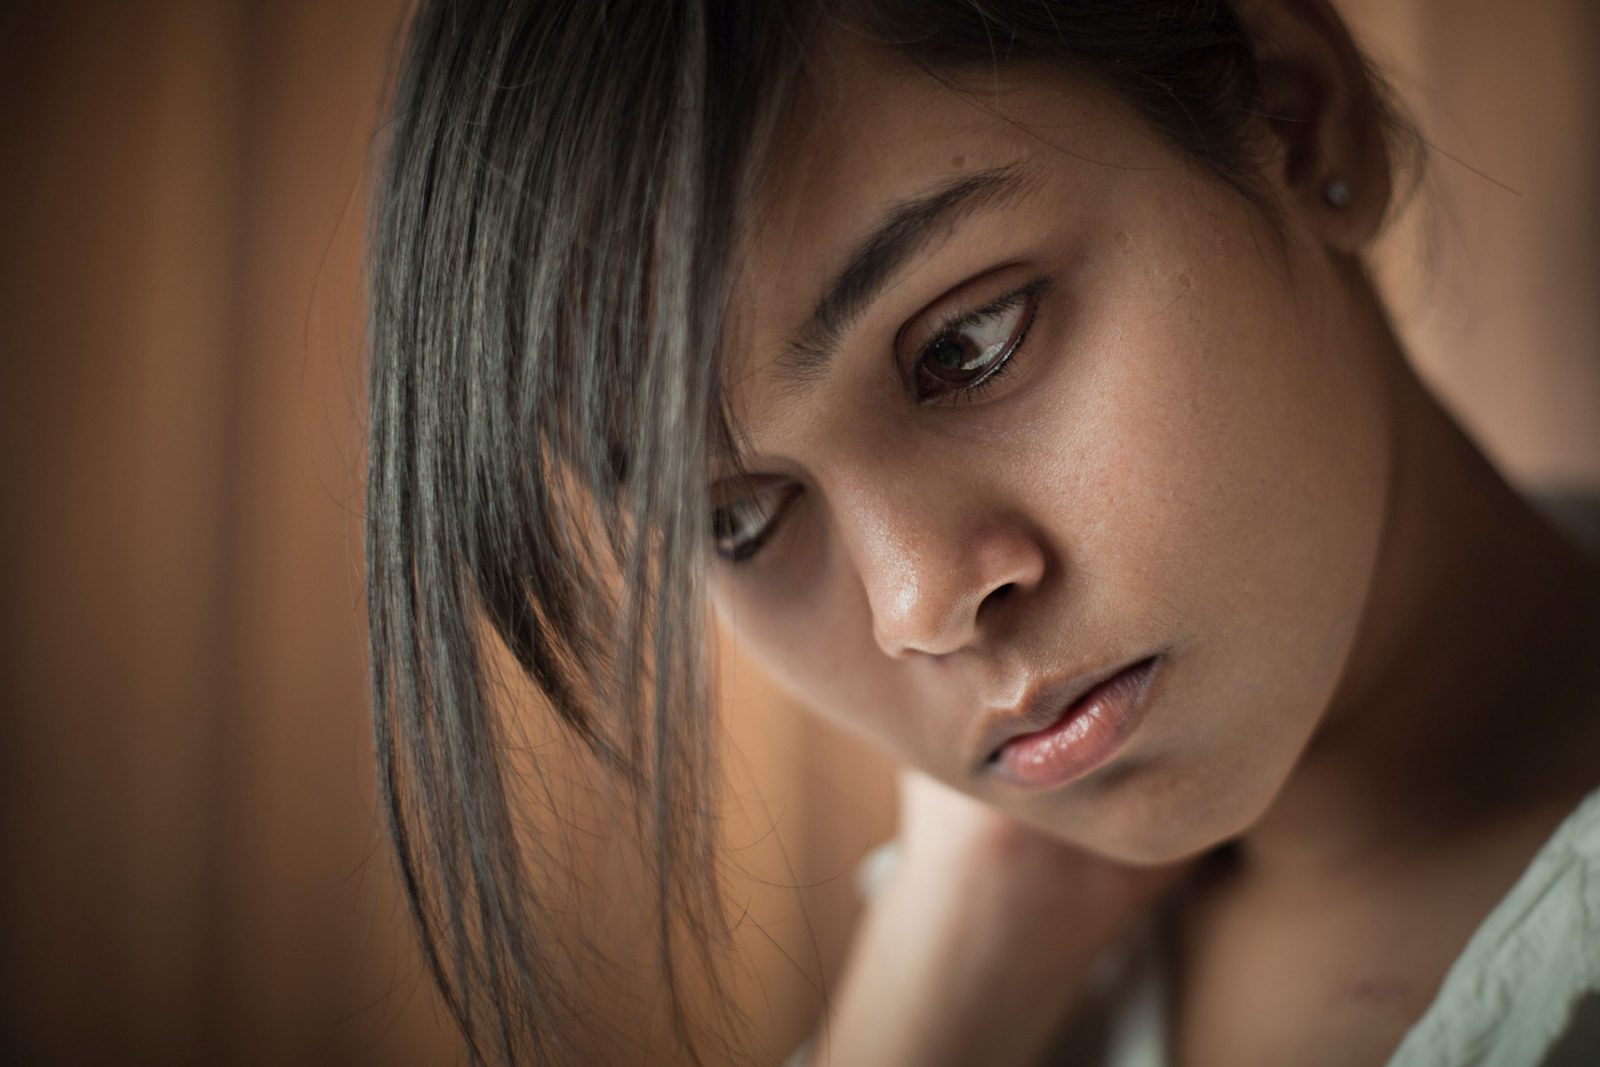 Anxious looking woman